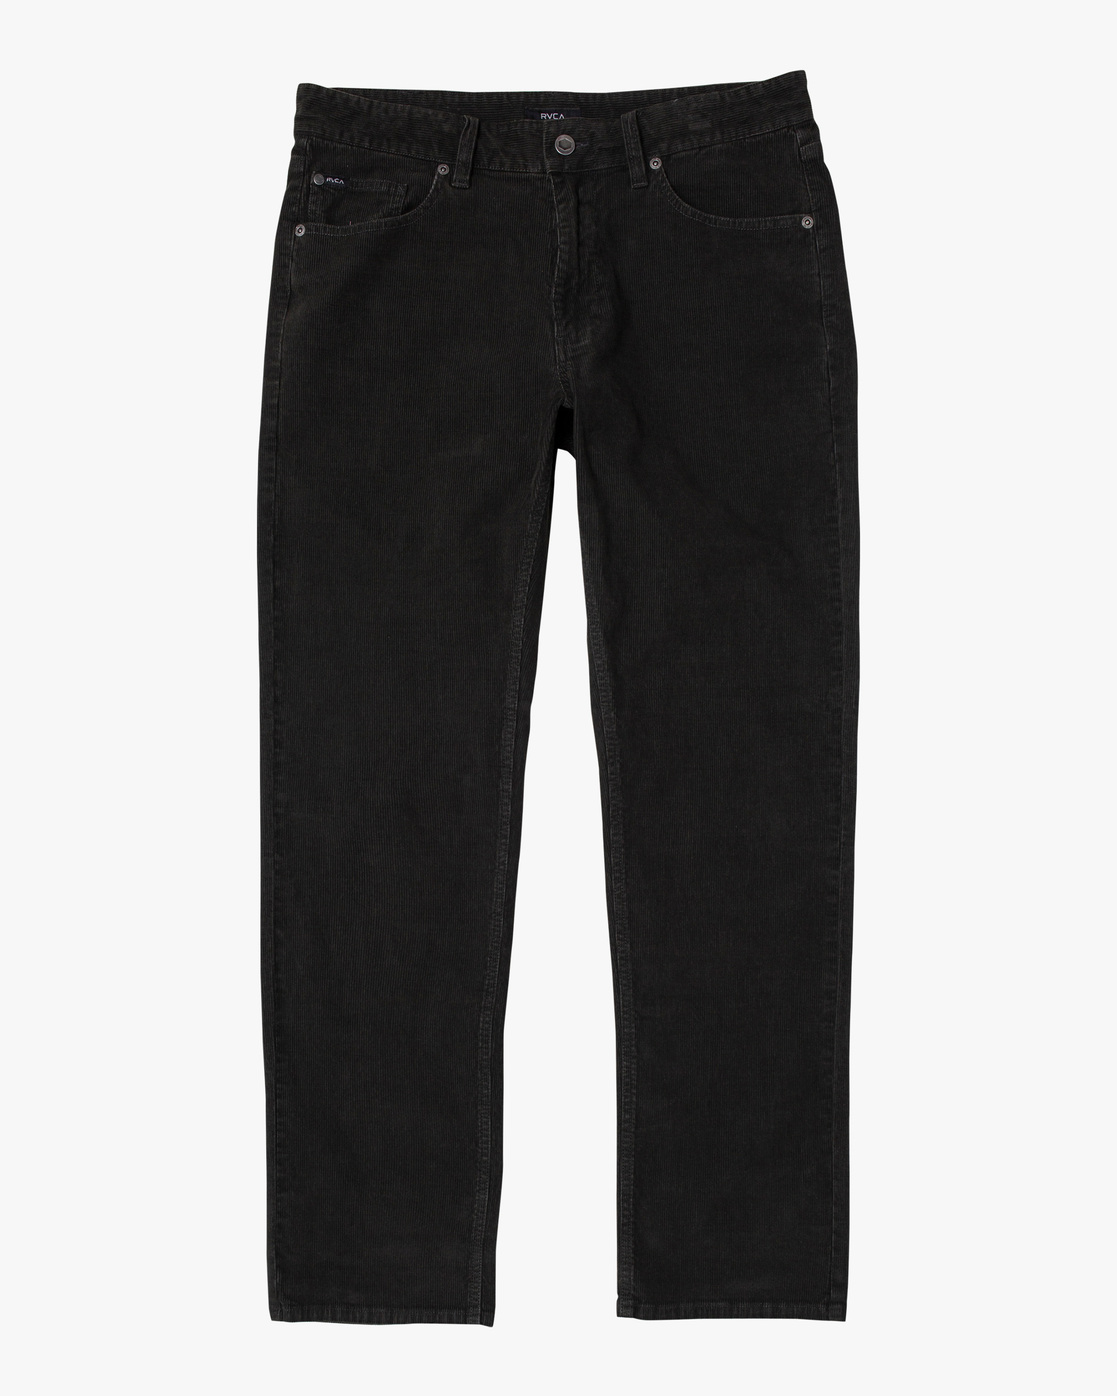 0 DAGGERS SLIM PIGMENT CORD PANT Black M3463RDC RVCA